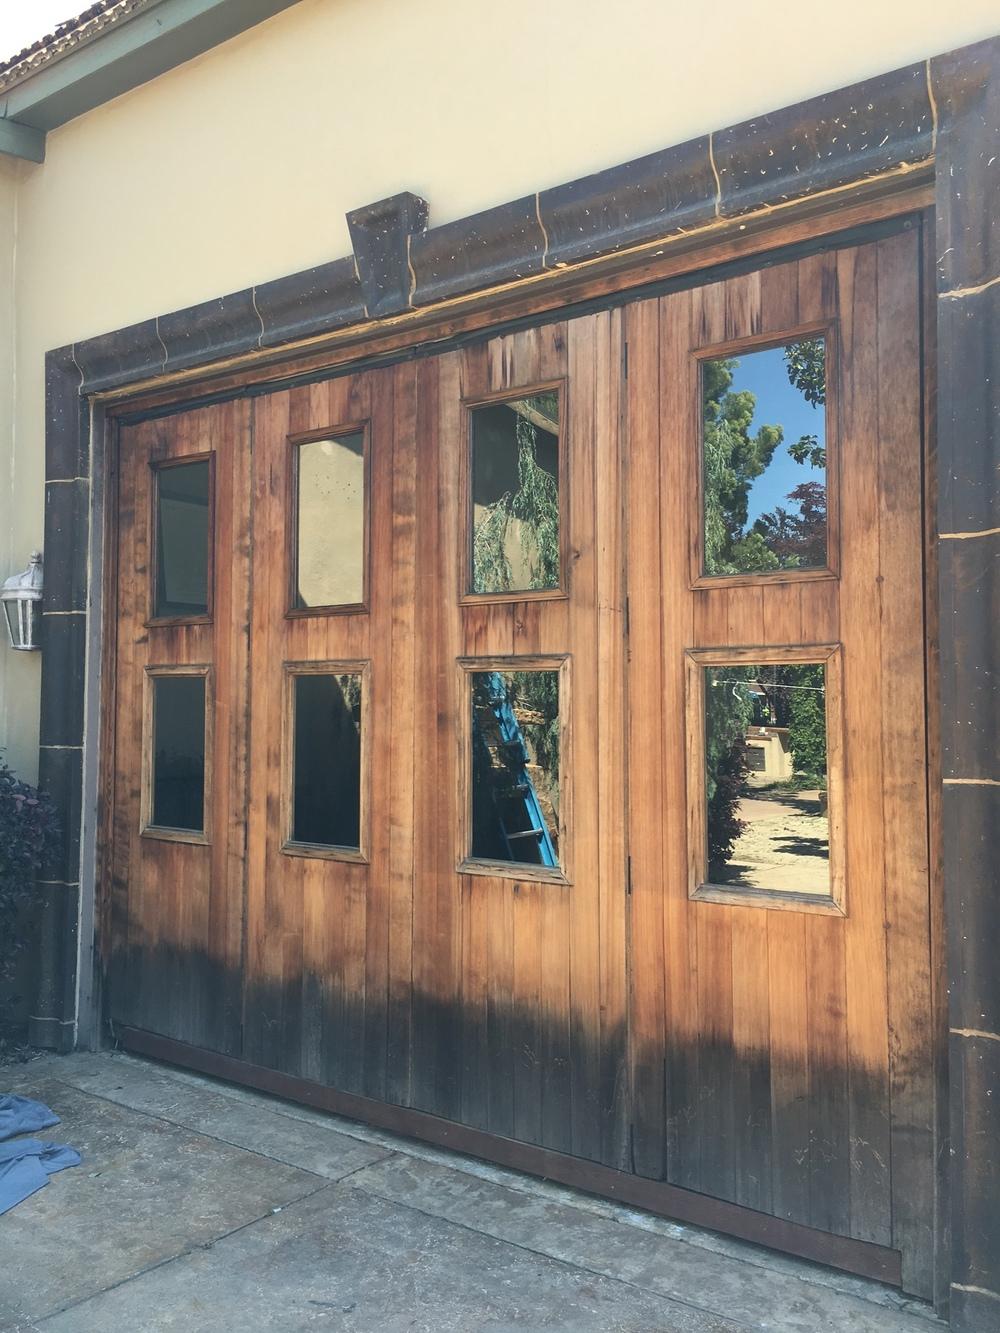 rustic-wedding-barn-doors-in-folsom-california-for-events-ceremonies-or-receptions.JPG